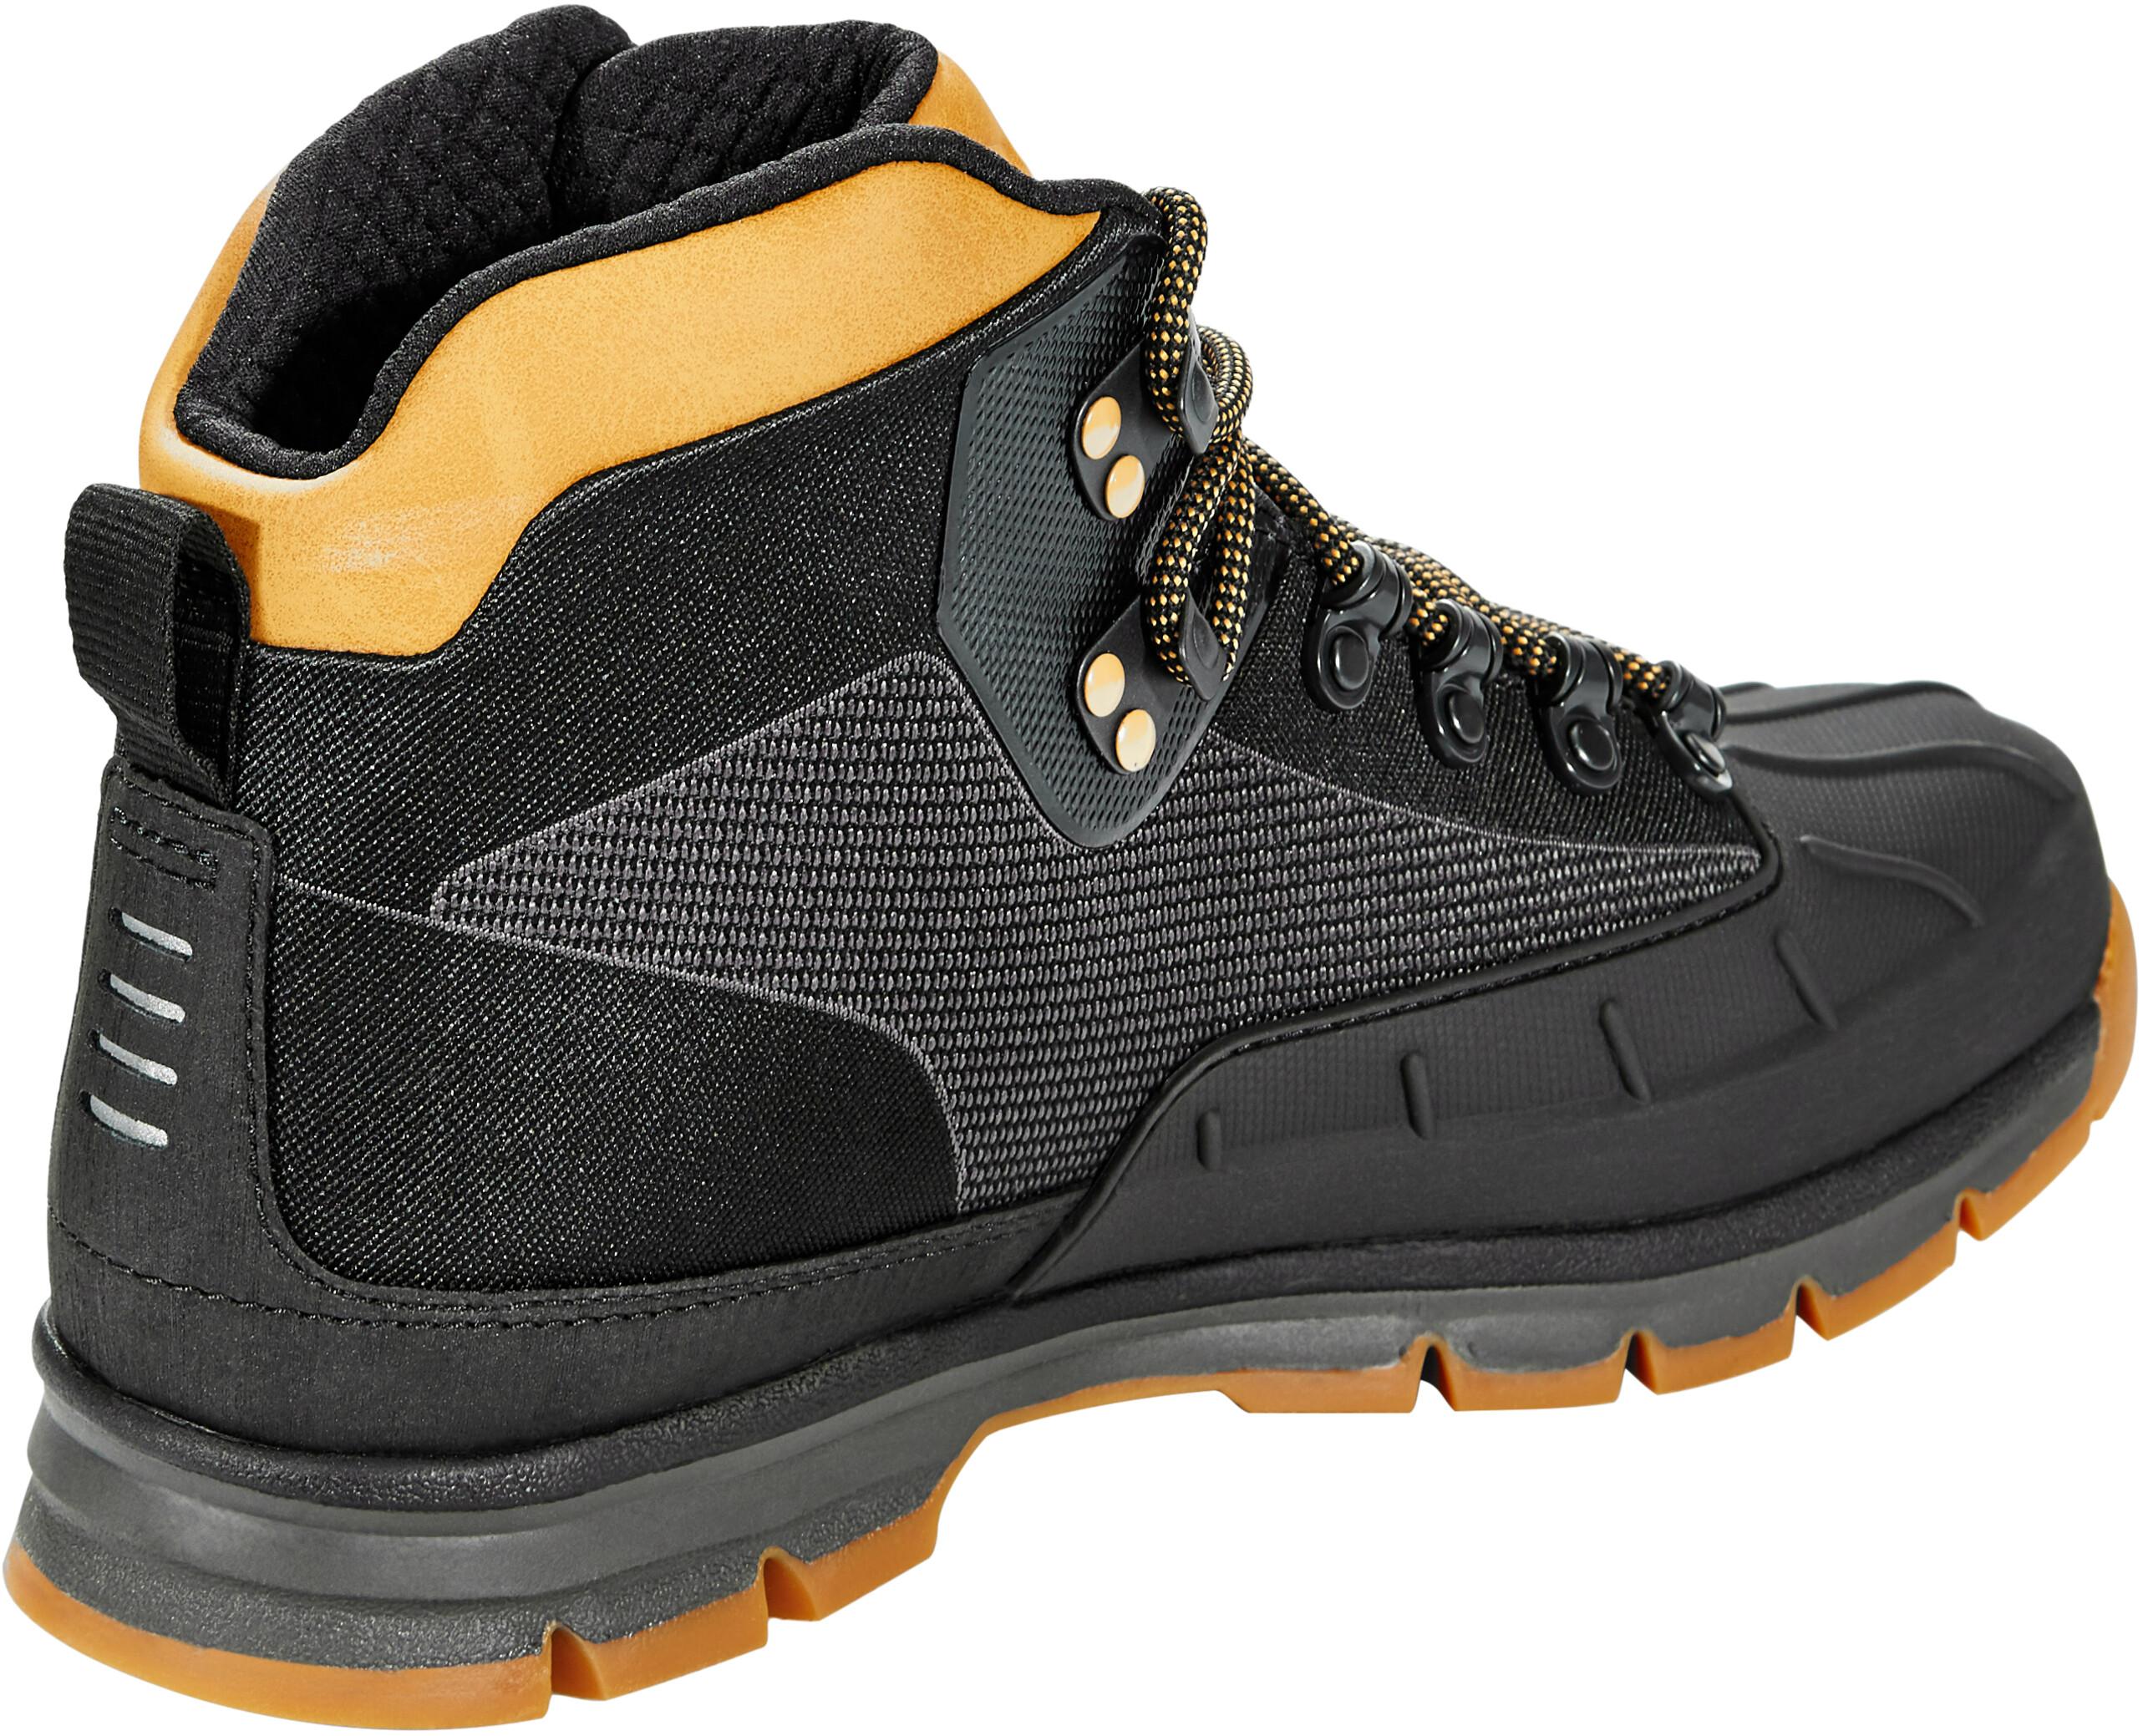 6998e265dad Timberland Euro Hiker Shell Toe Scarpe Jacquard Uomo, black/wheat